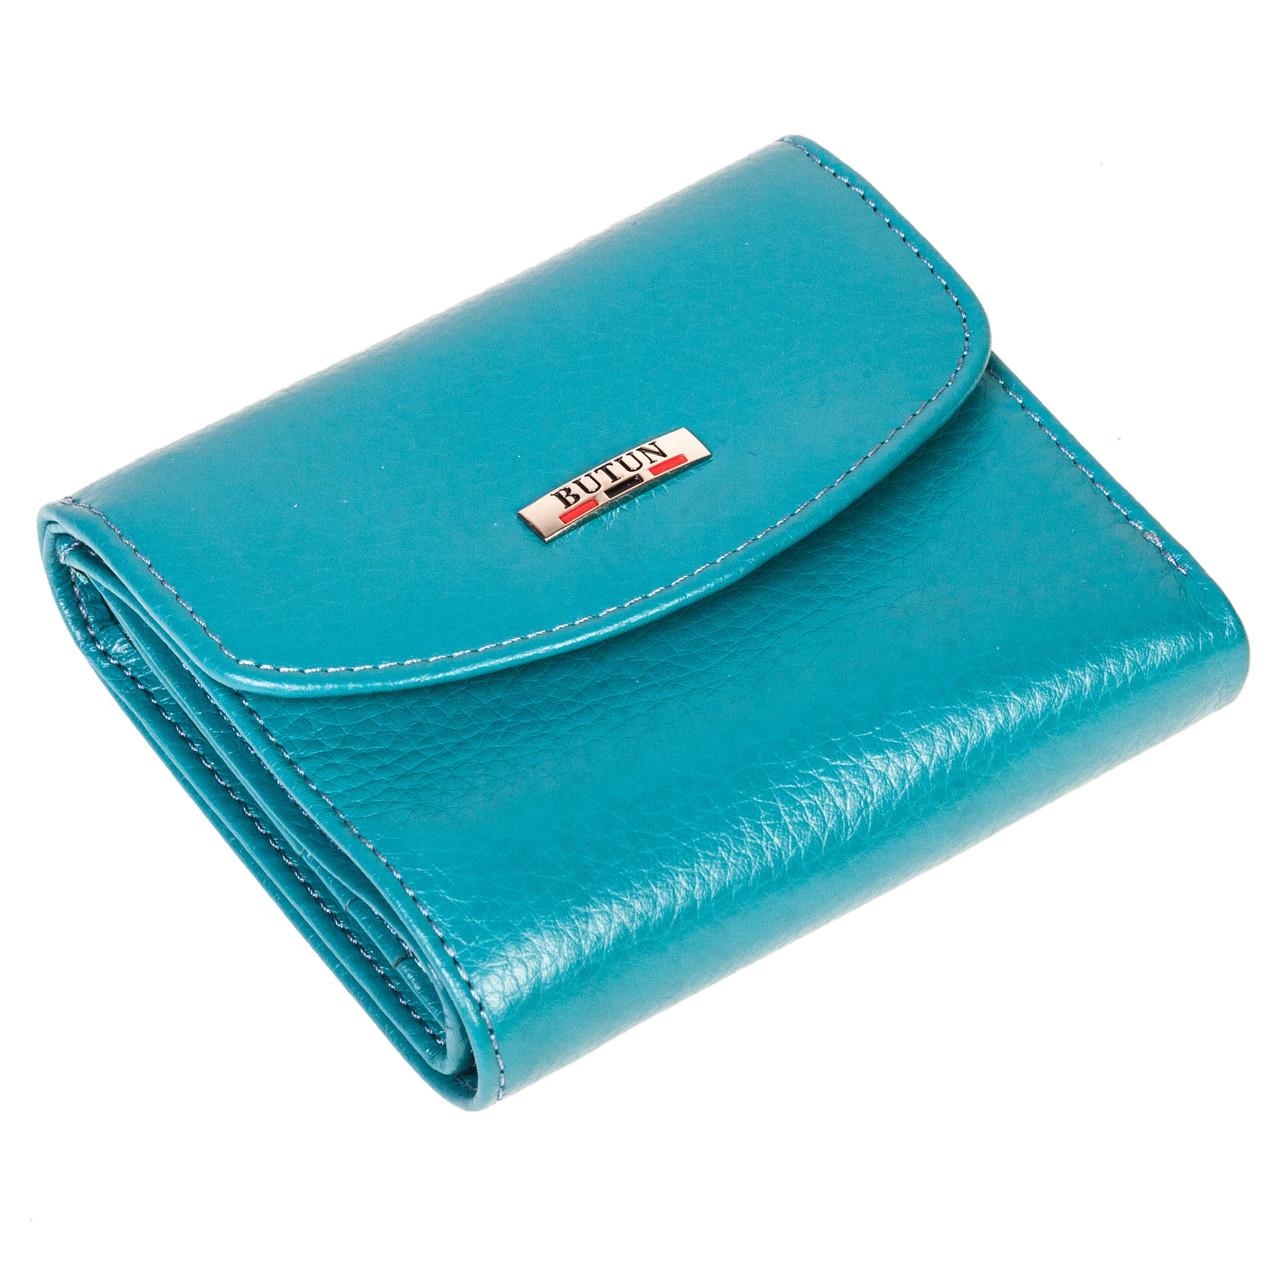 Женский кошелек кожаный бирюзовый Butun 584-004-050